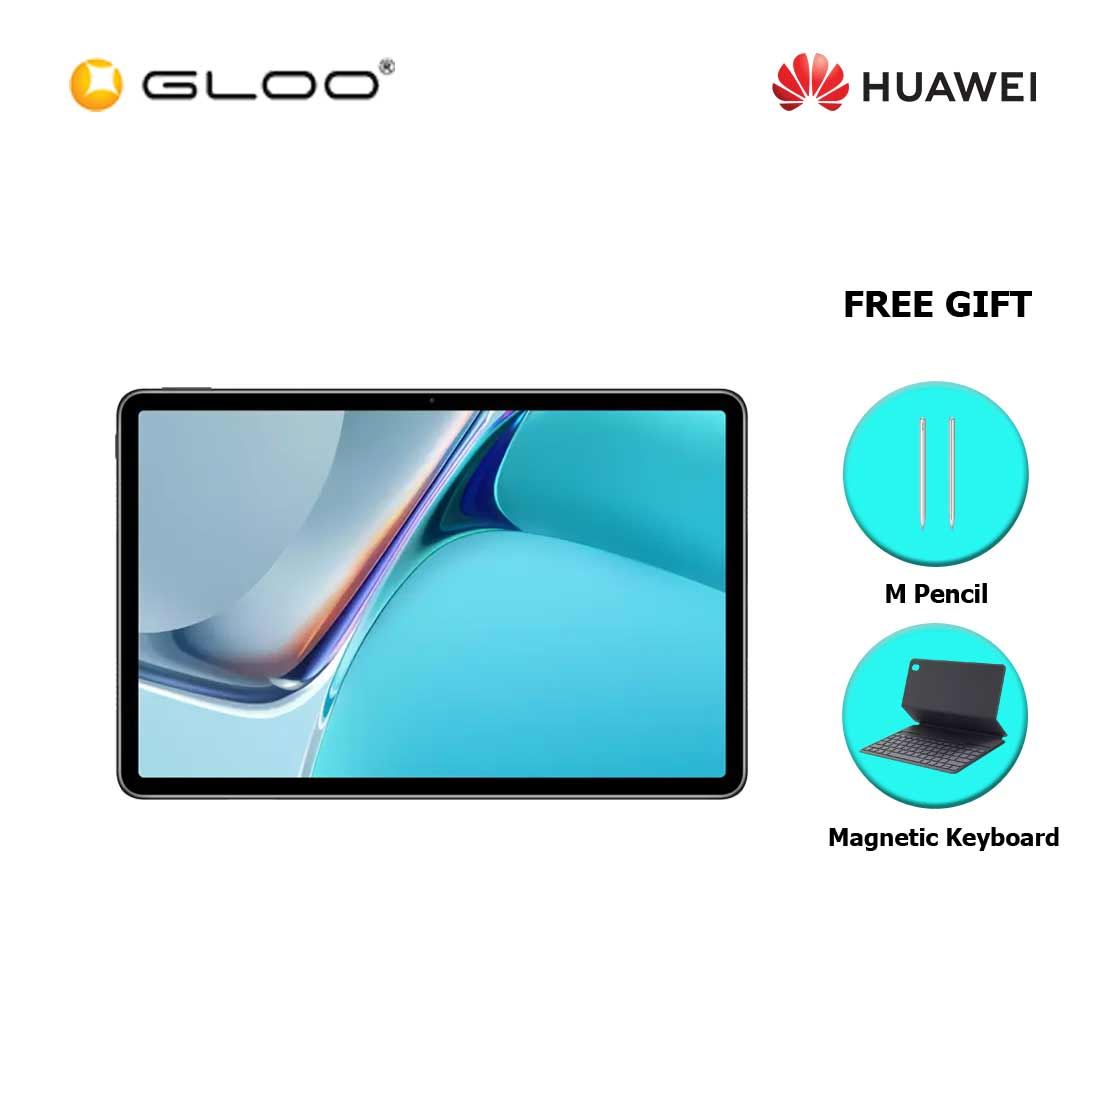 [Pre-Order] Huawei Matepad 11 128GB Matte Grey FREE Huawei Matepad 11 M Pencil + Huawei Matepad 11 Magnetic Keyboard (ETA : 6.8.2021)